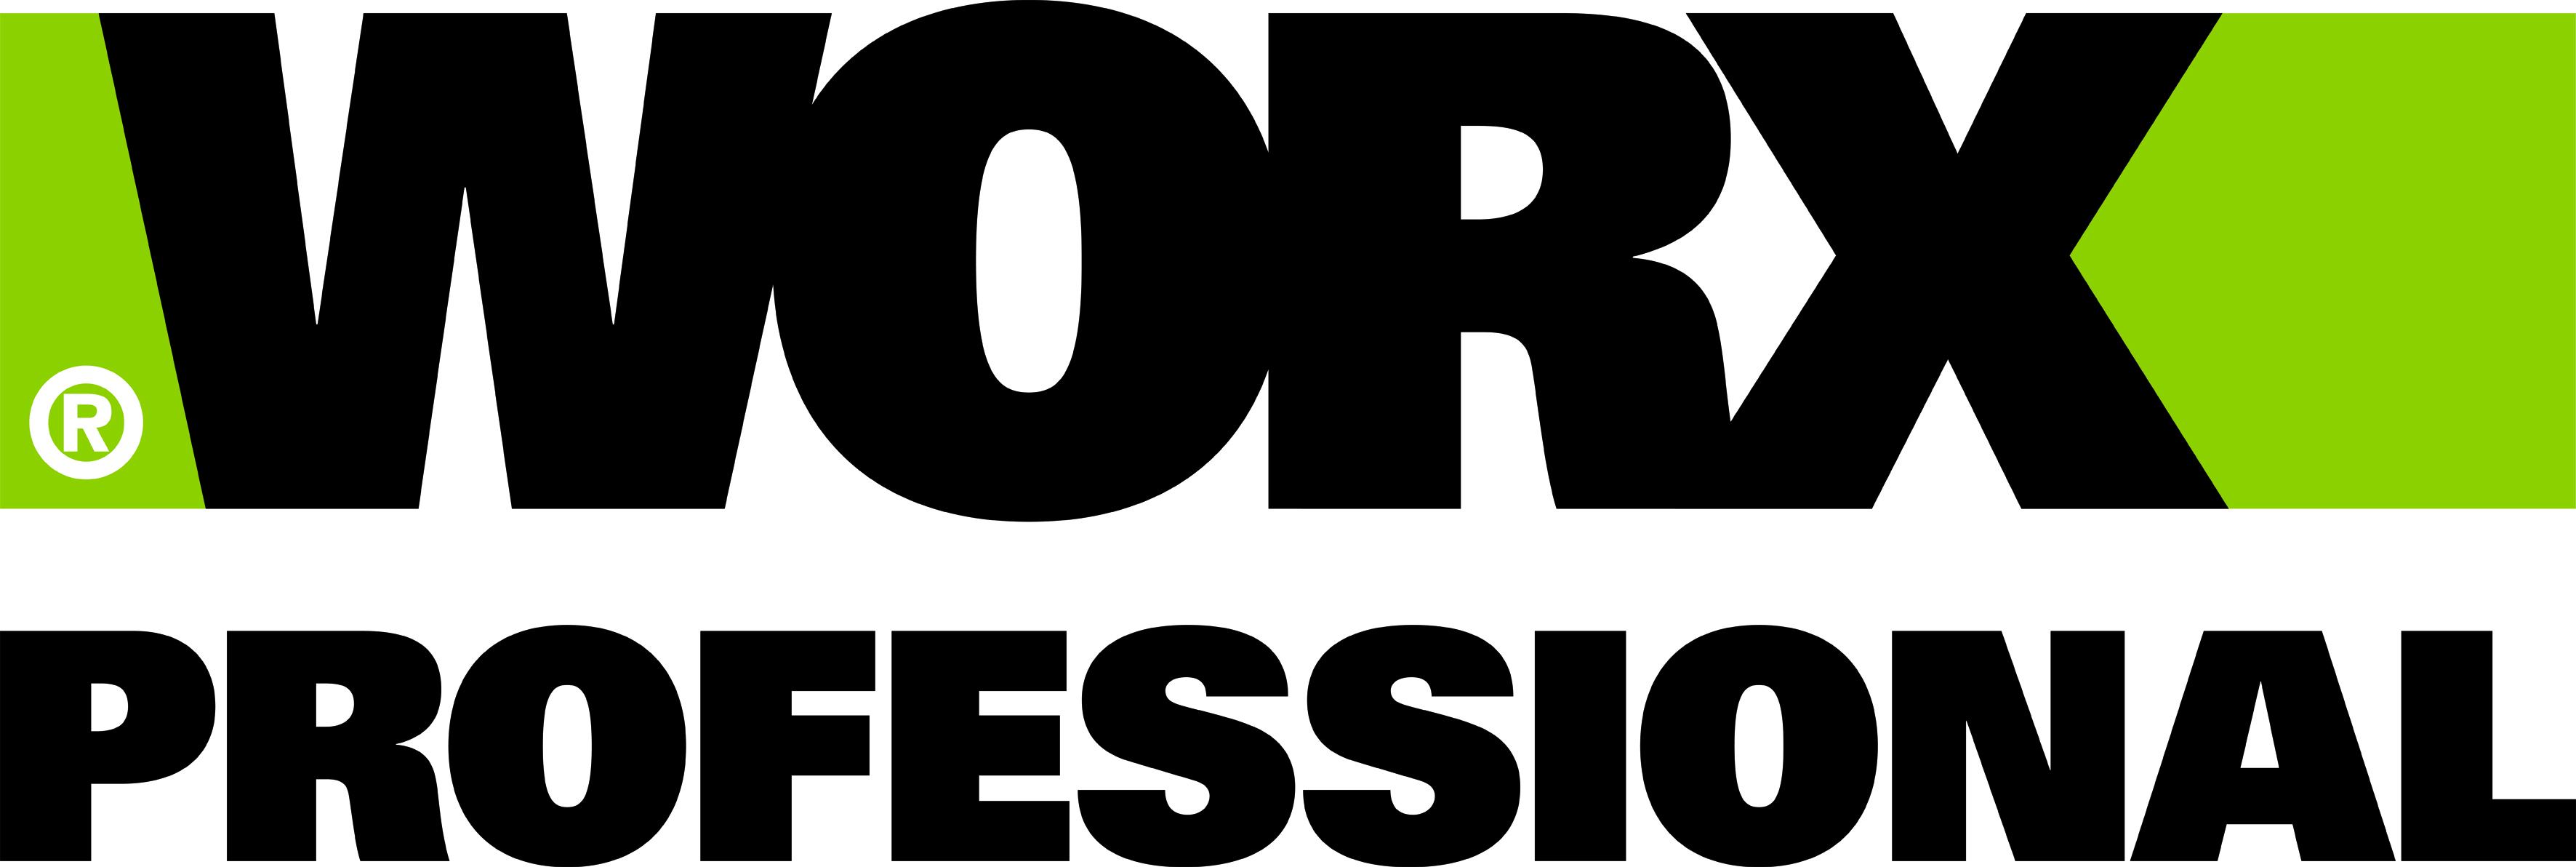 worx-naradi-logo